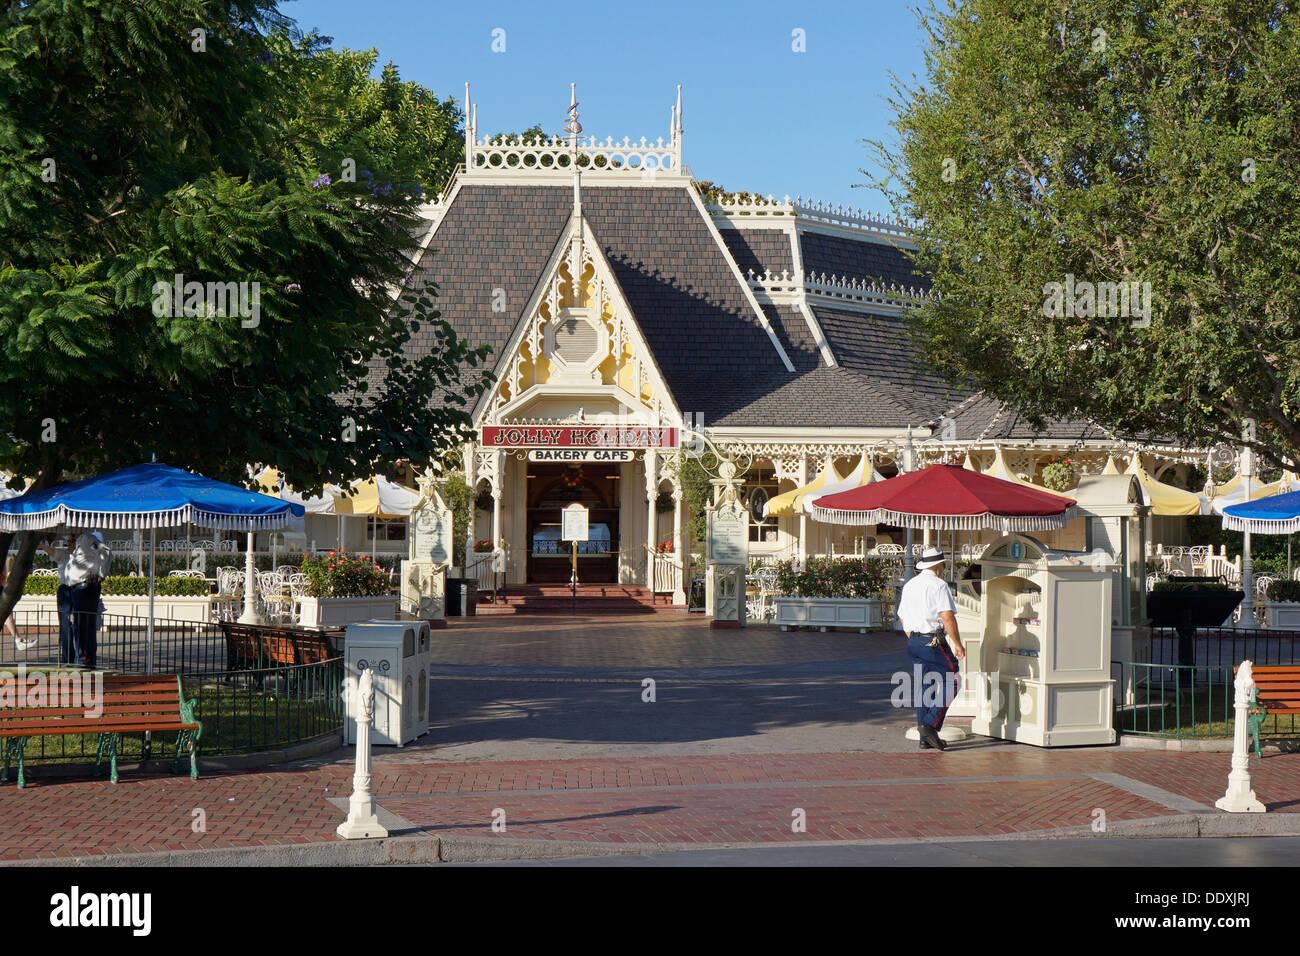 Disneyland, Jolly vacanza, il Bakery Cafe su Main Street, Anaheim, California Immagini Stock